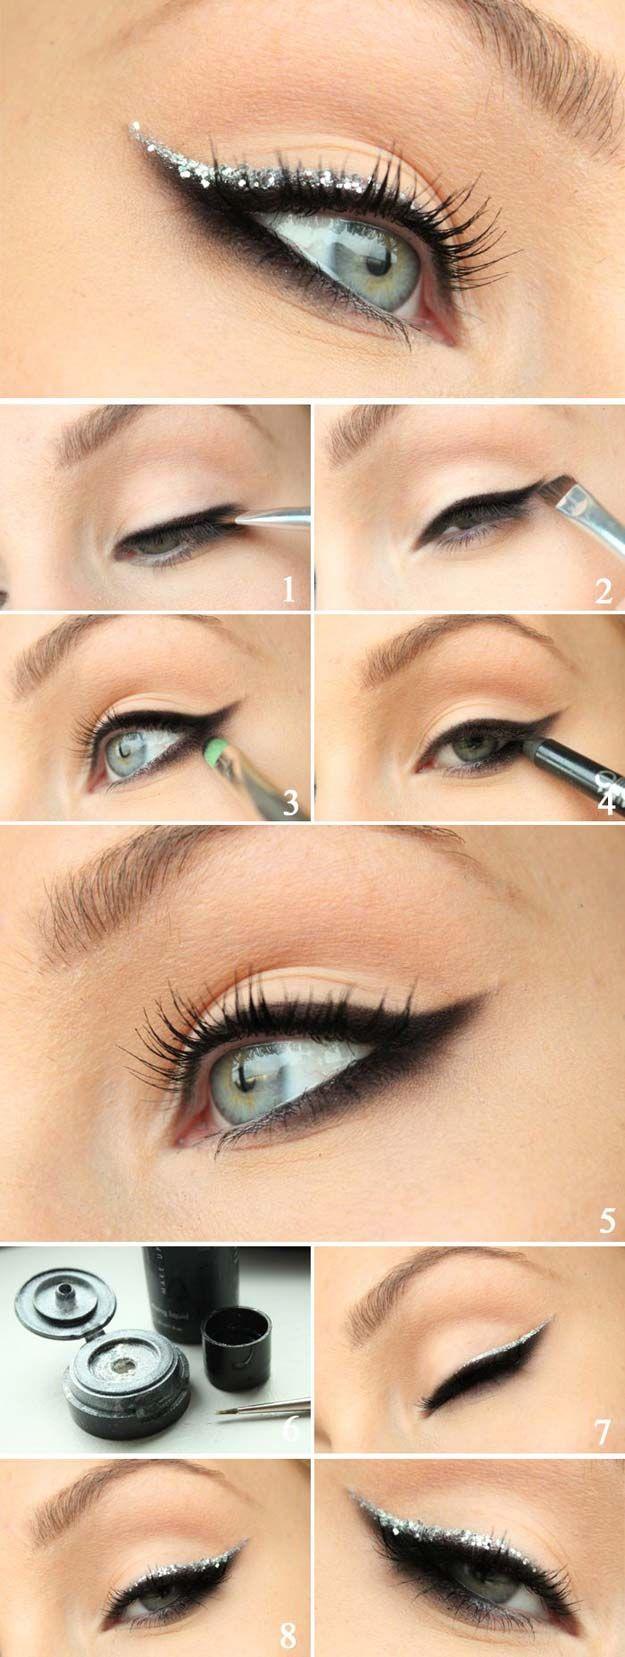 Best Makeup Tutorials for Teens -Holiday Glitter - Easy Makeup Ideas for Beginne...